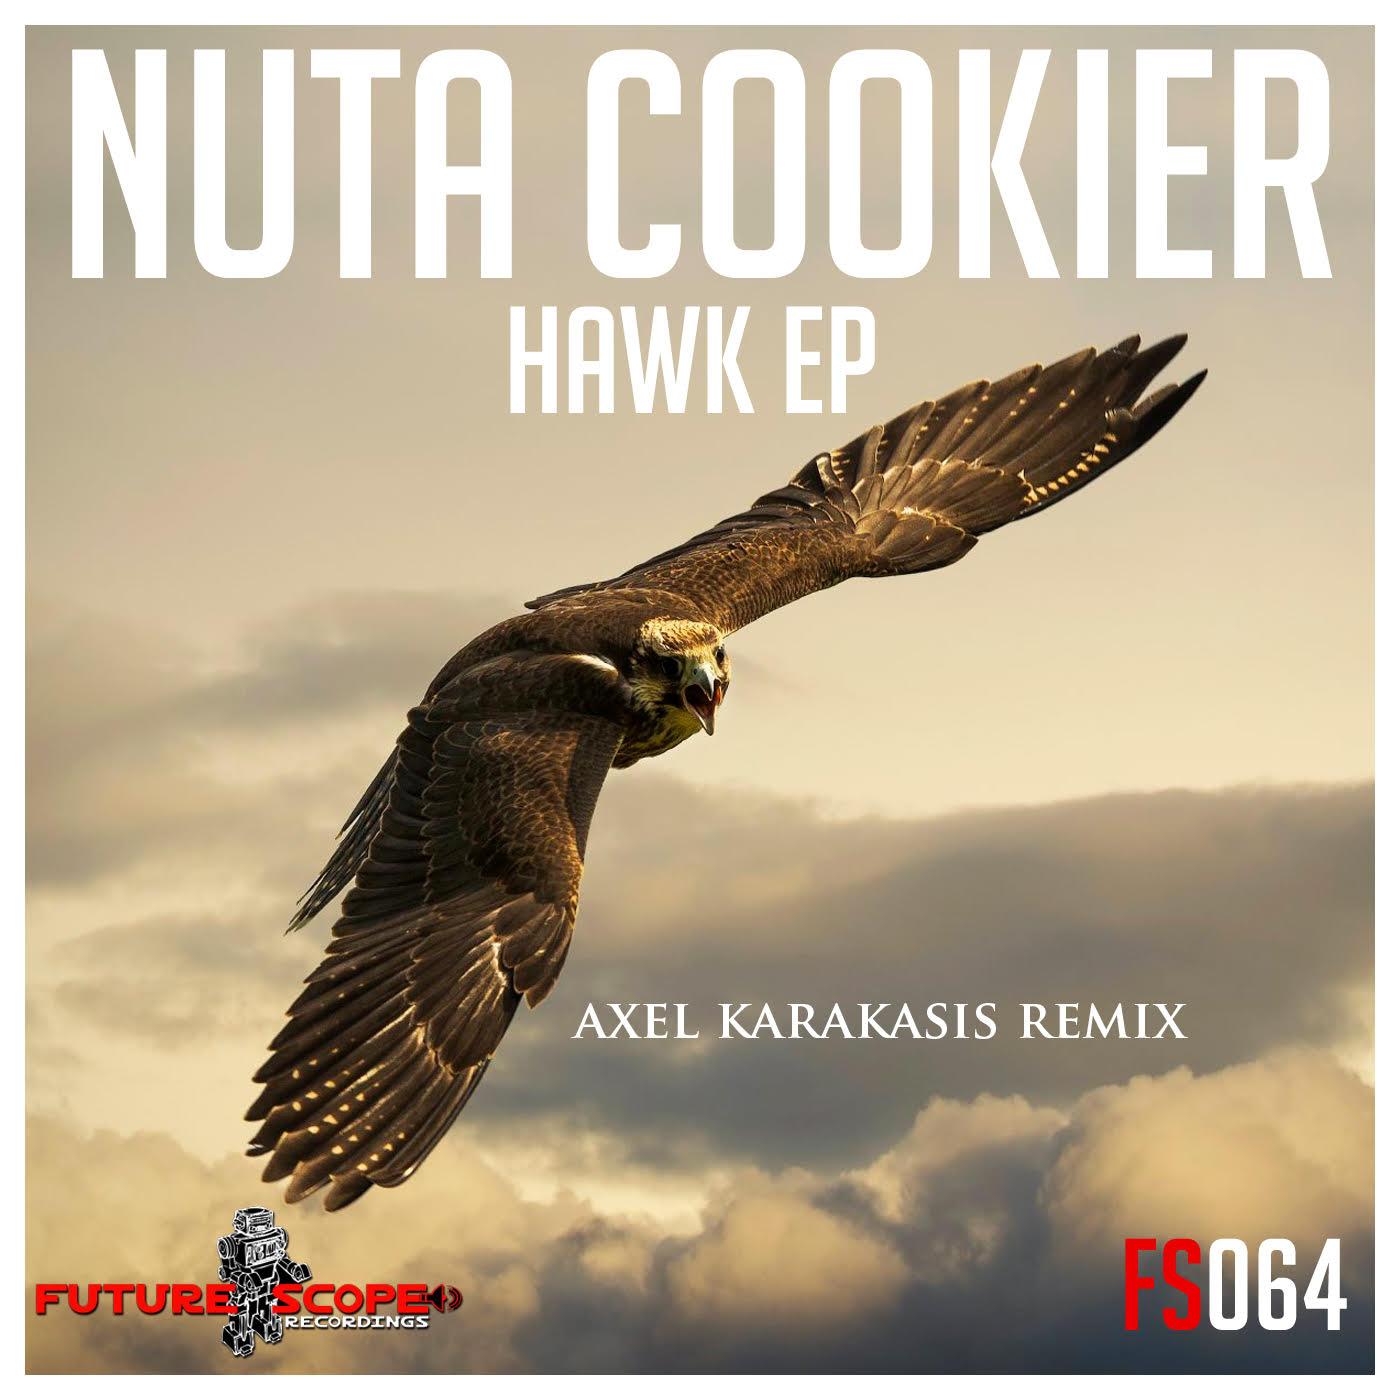 Hawk EP by Nuta Cookier terá remix de Axel Karakasis Alltv, Axel Karakasis, EP, Fullmix, future scope recordings, hawk ep, nuta cookier, Remix